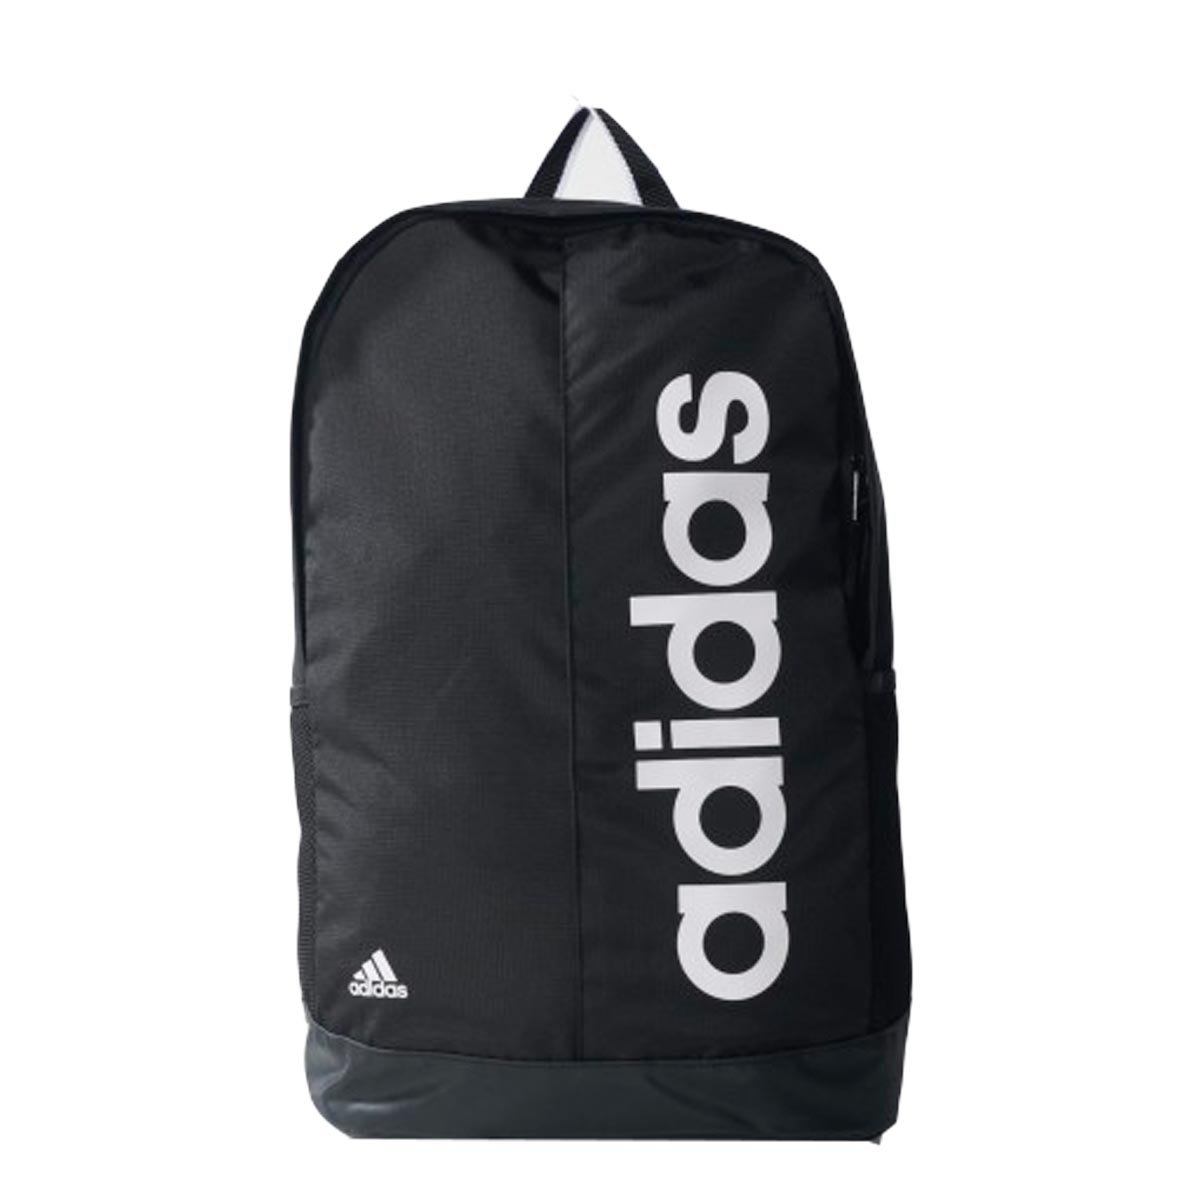 9c54a624e Bizz Store - Mochila Adidas Lin Per BP Preta Unissex Esportiva